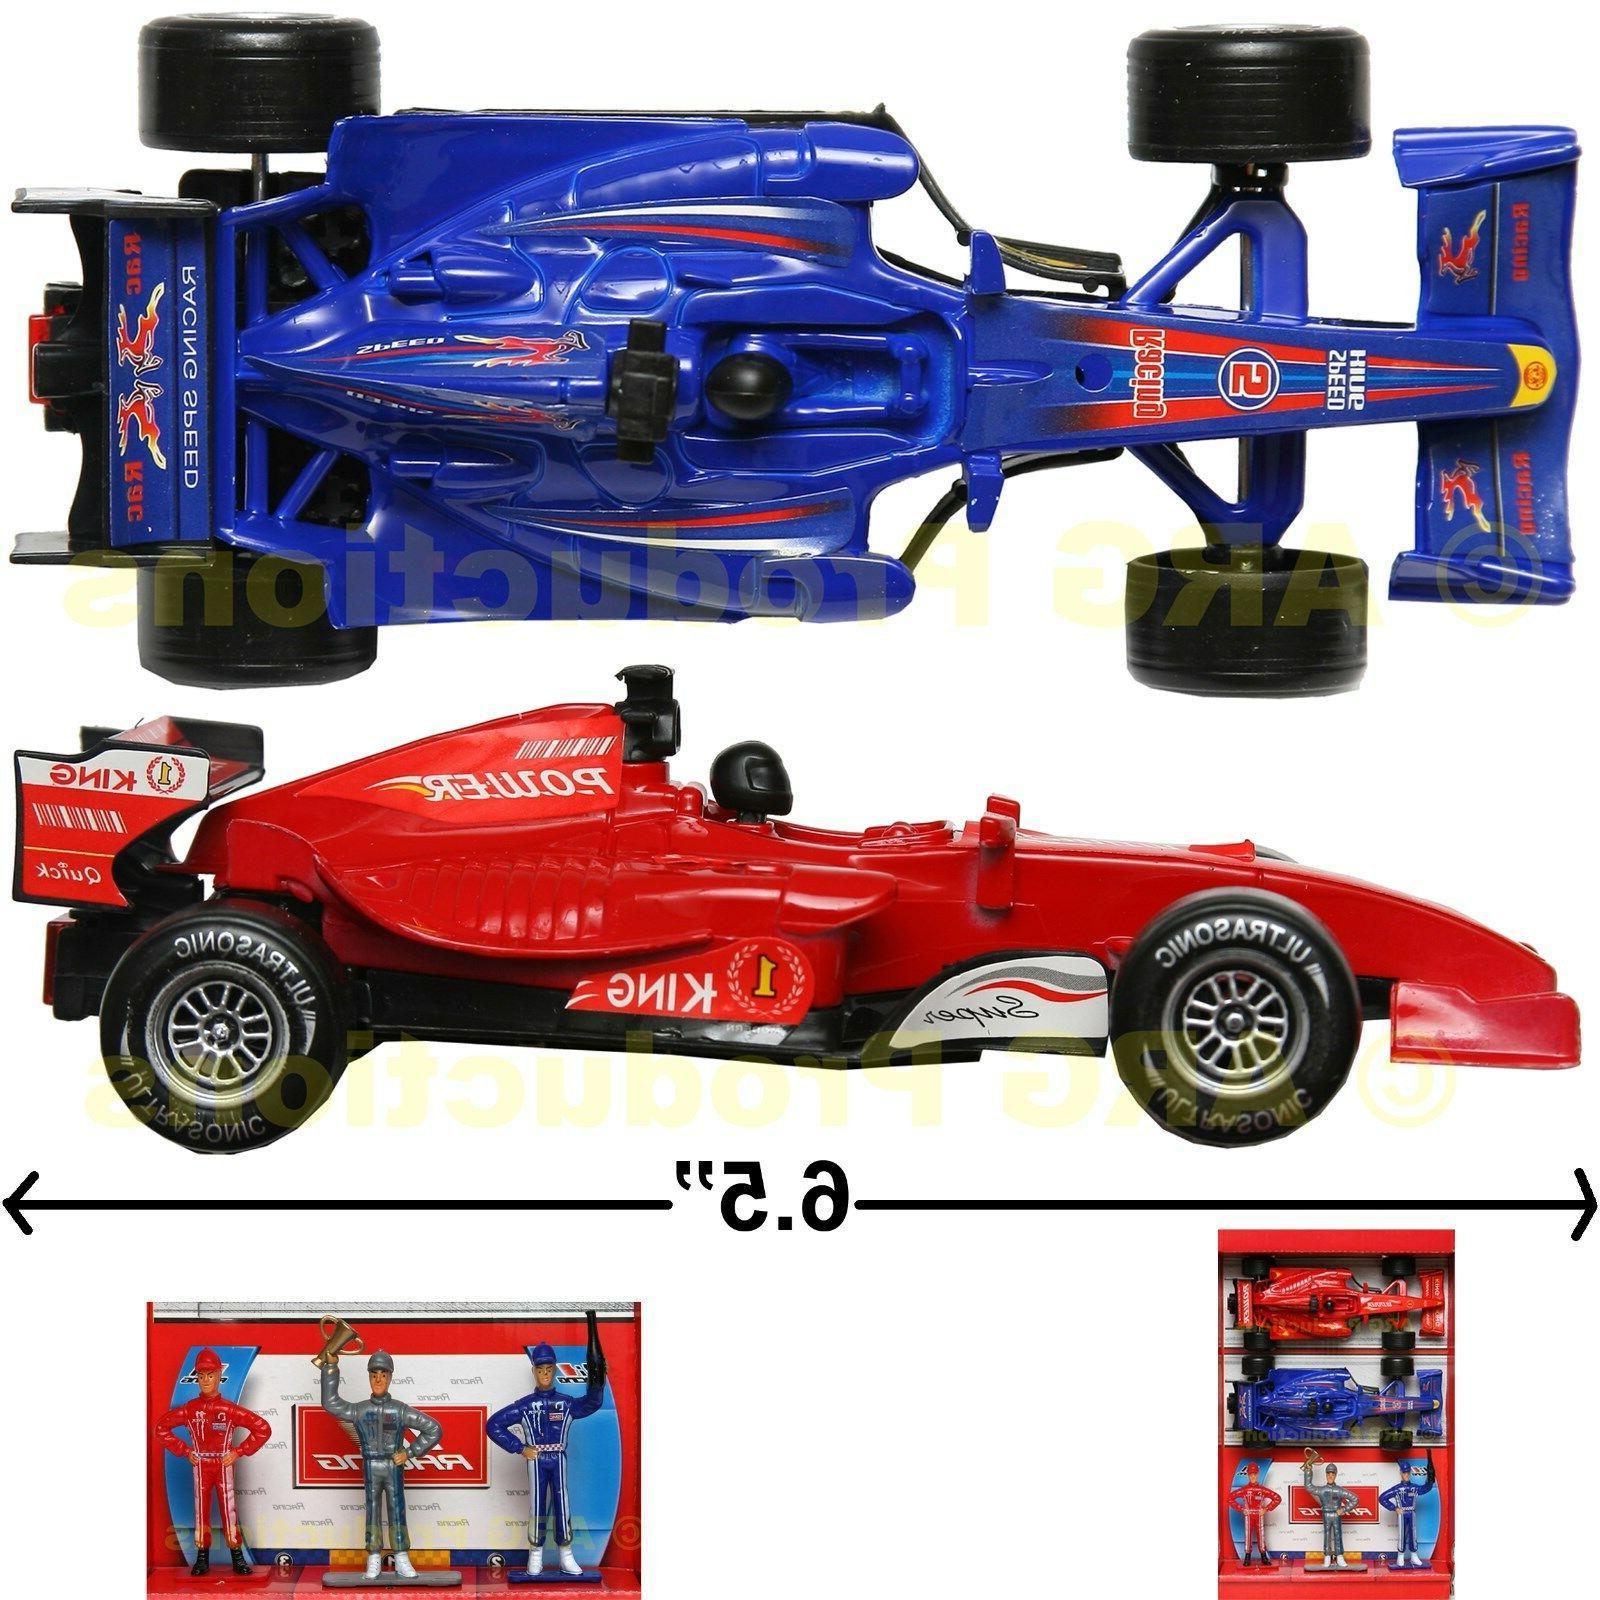 FORMULA 1 RACING CAR TOY SET OF 2  F1 TRACK RACE FIGURINE LI